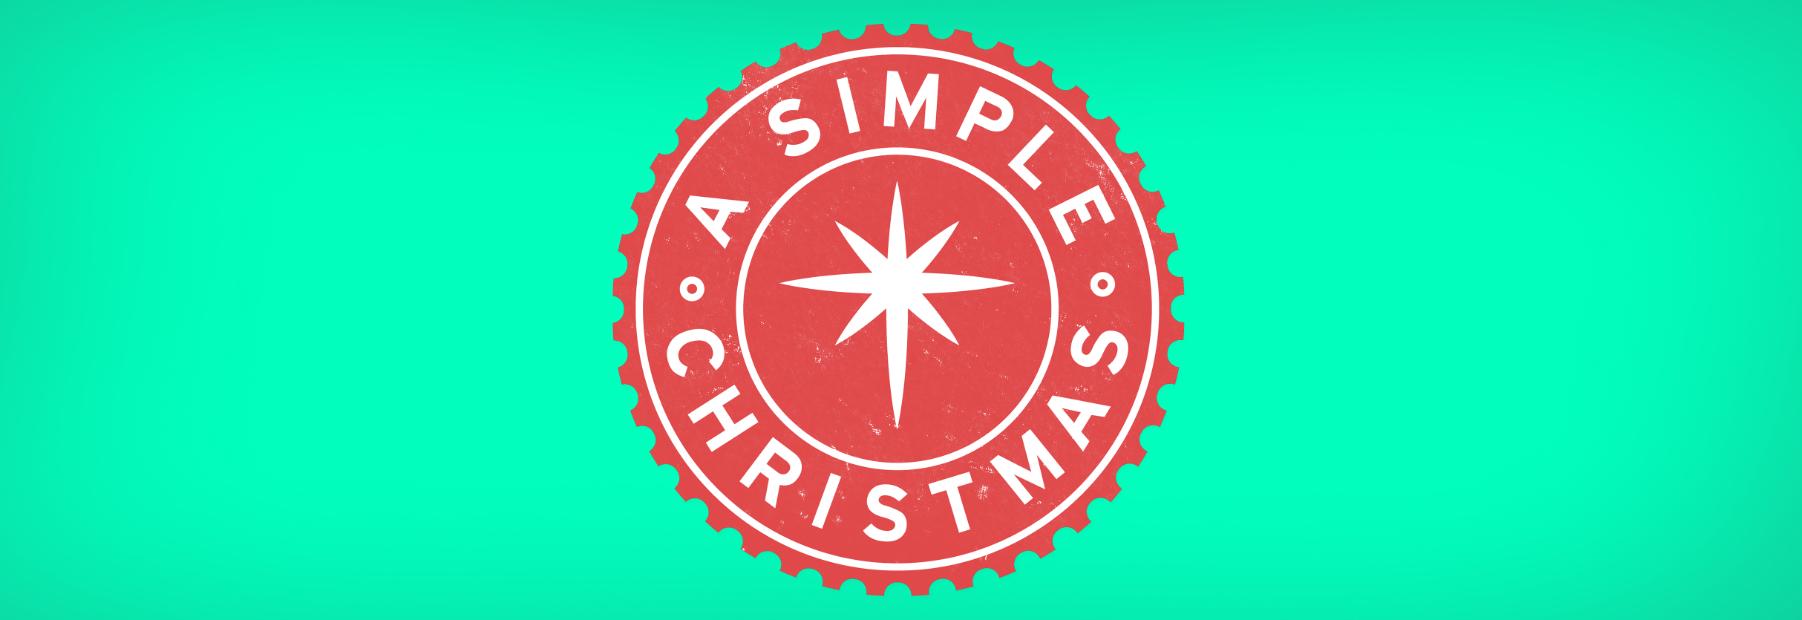 A Simple Christmas webbanner.jpg